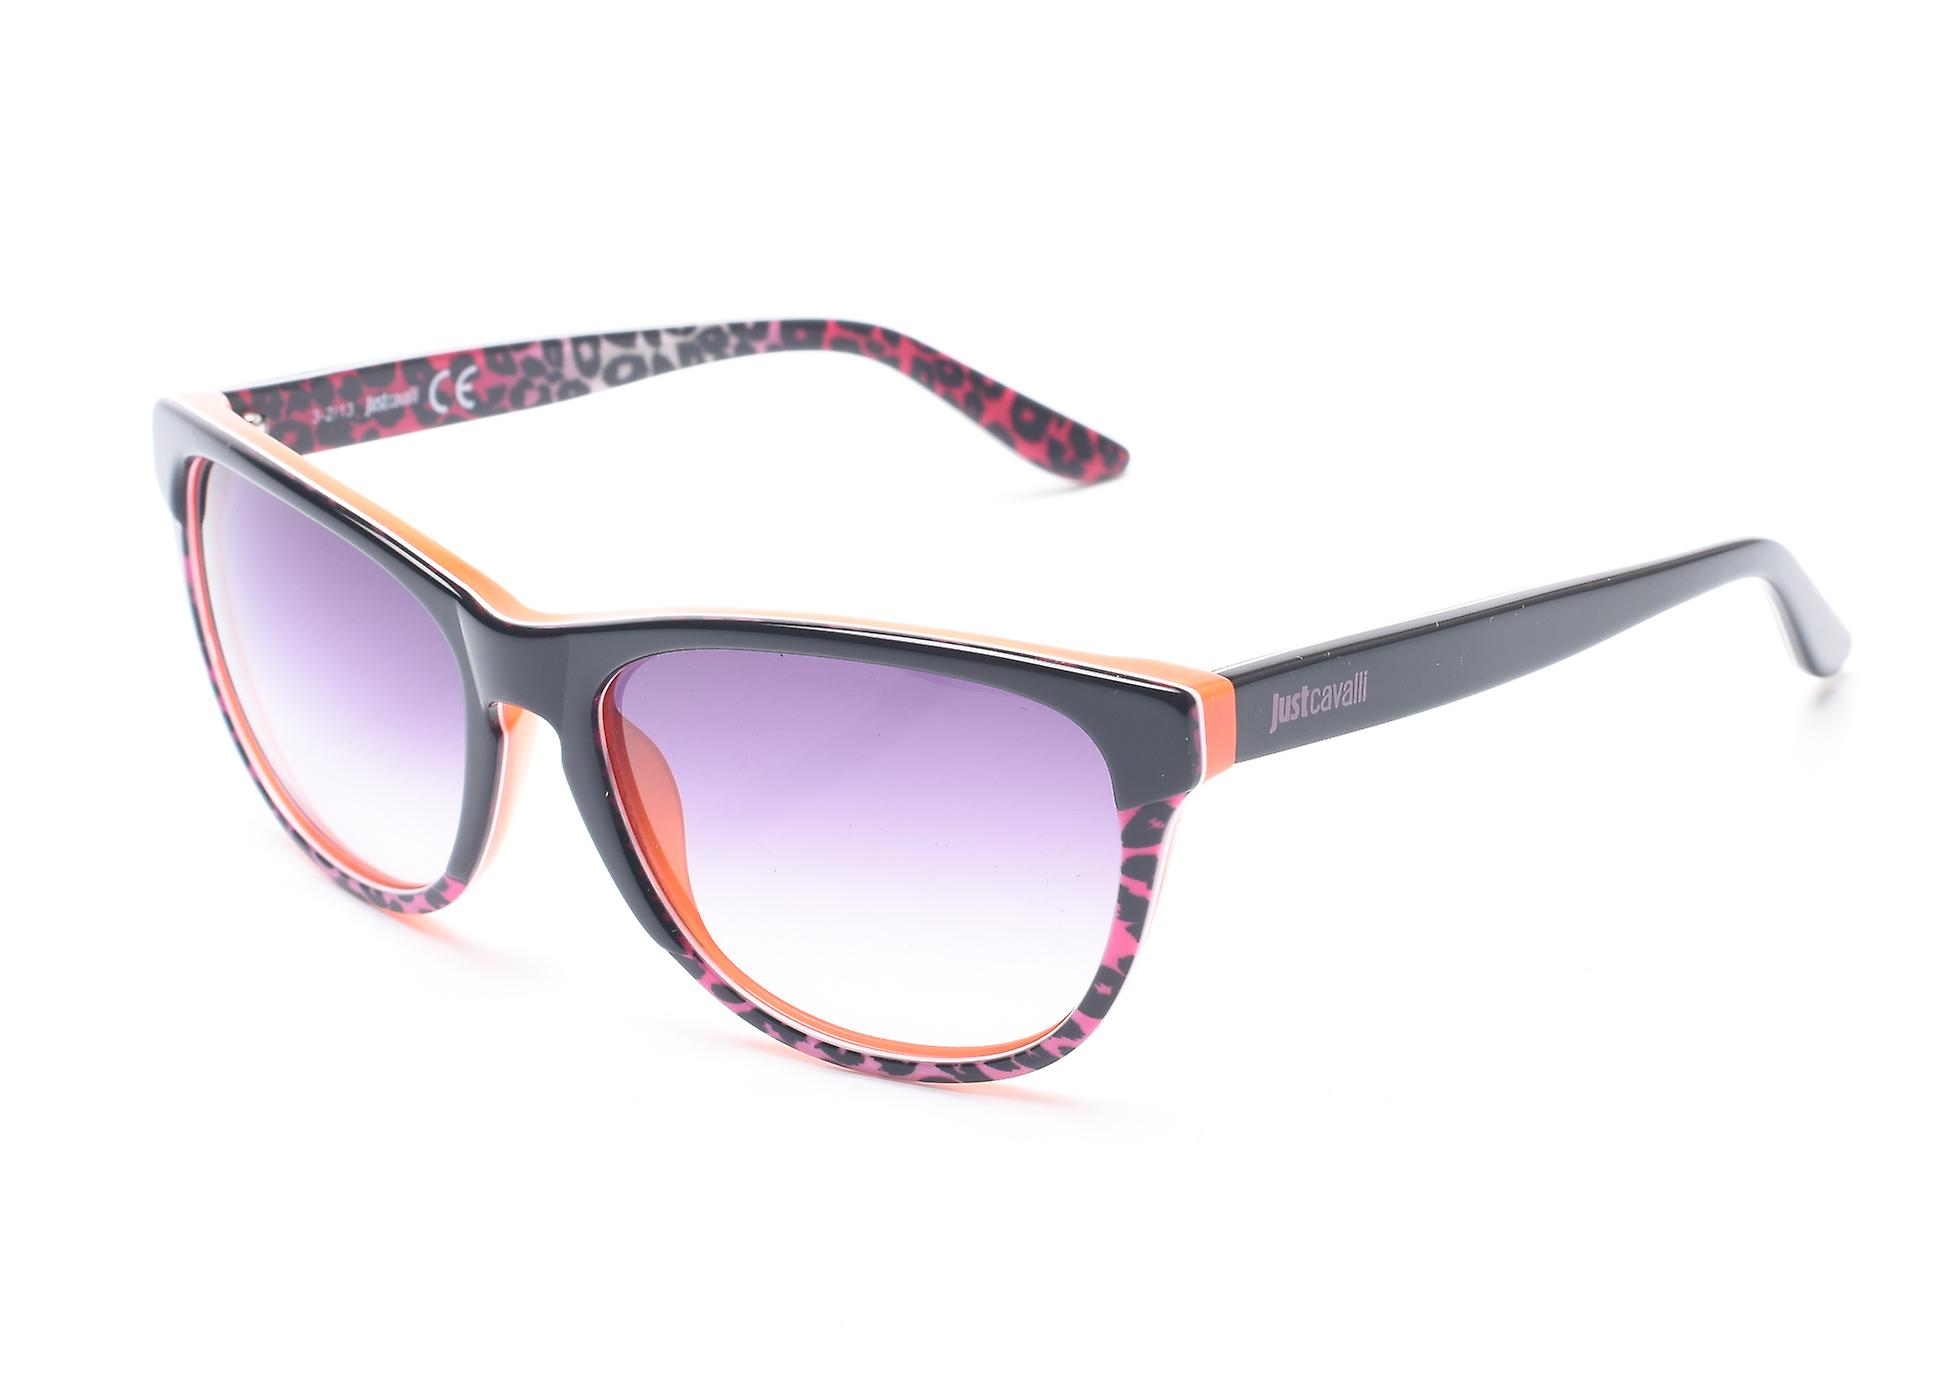 Just Cavalli Women's Cheetah Print Classic Style Sunglasses Black/Orange/Cheetah